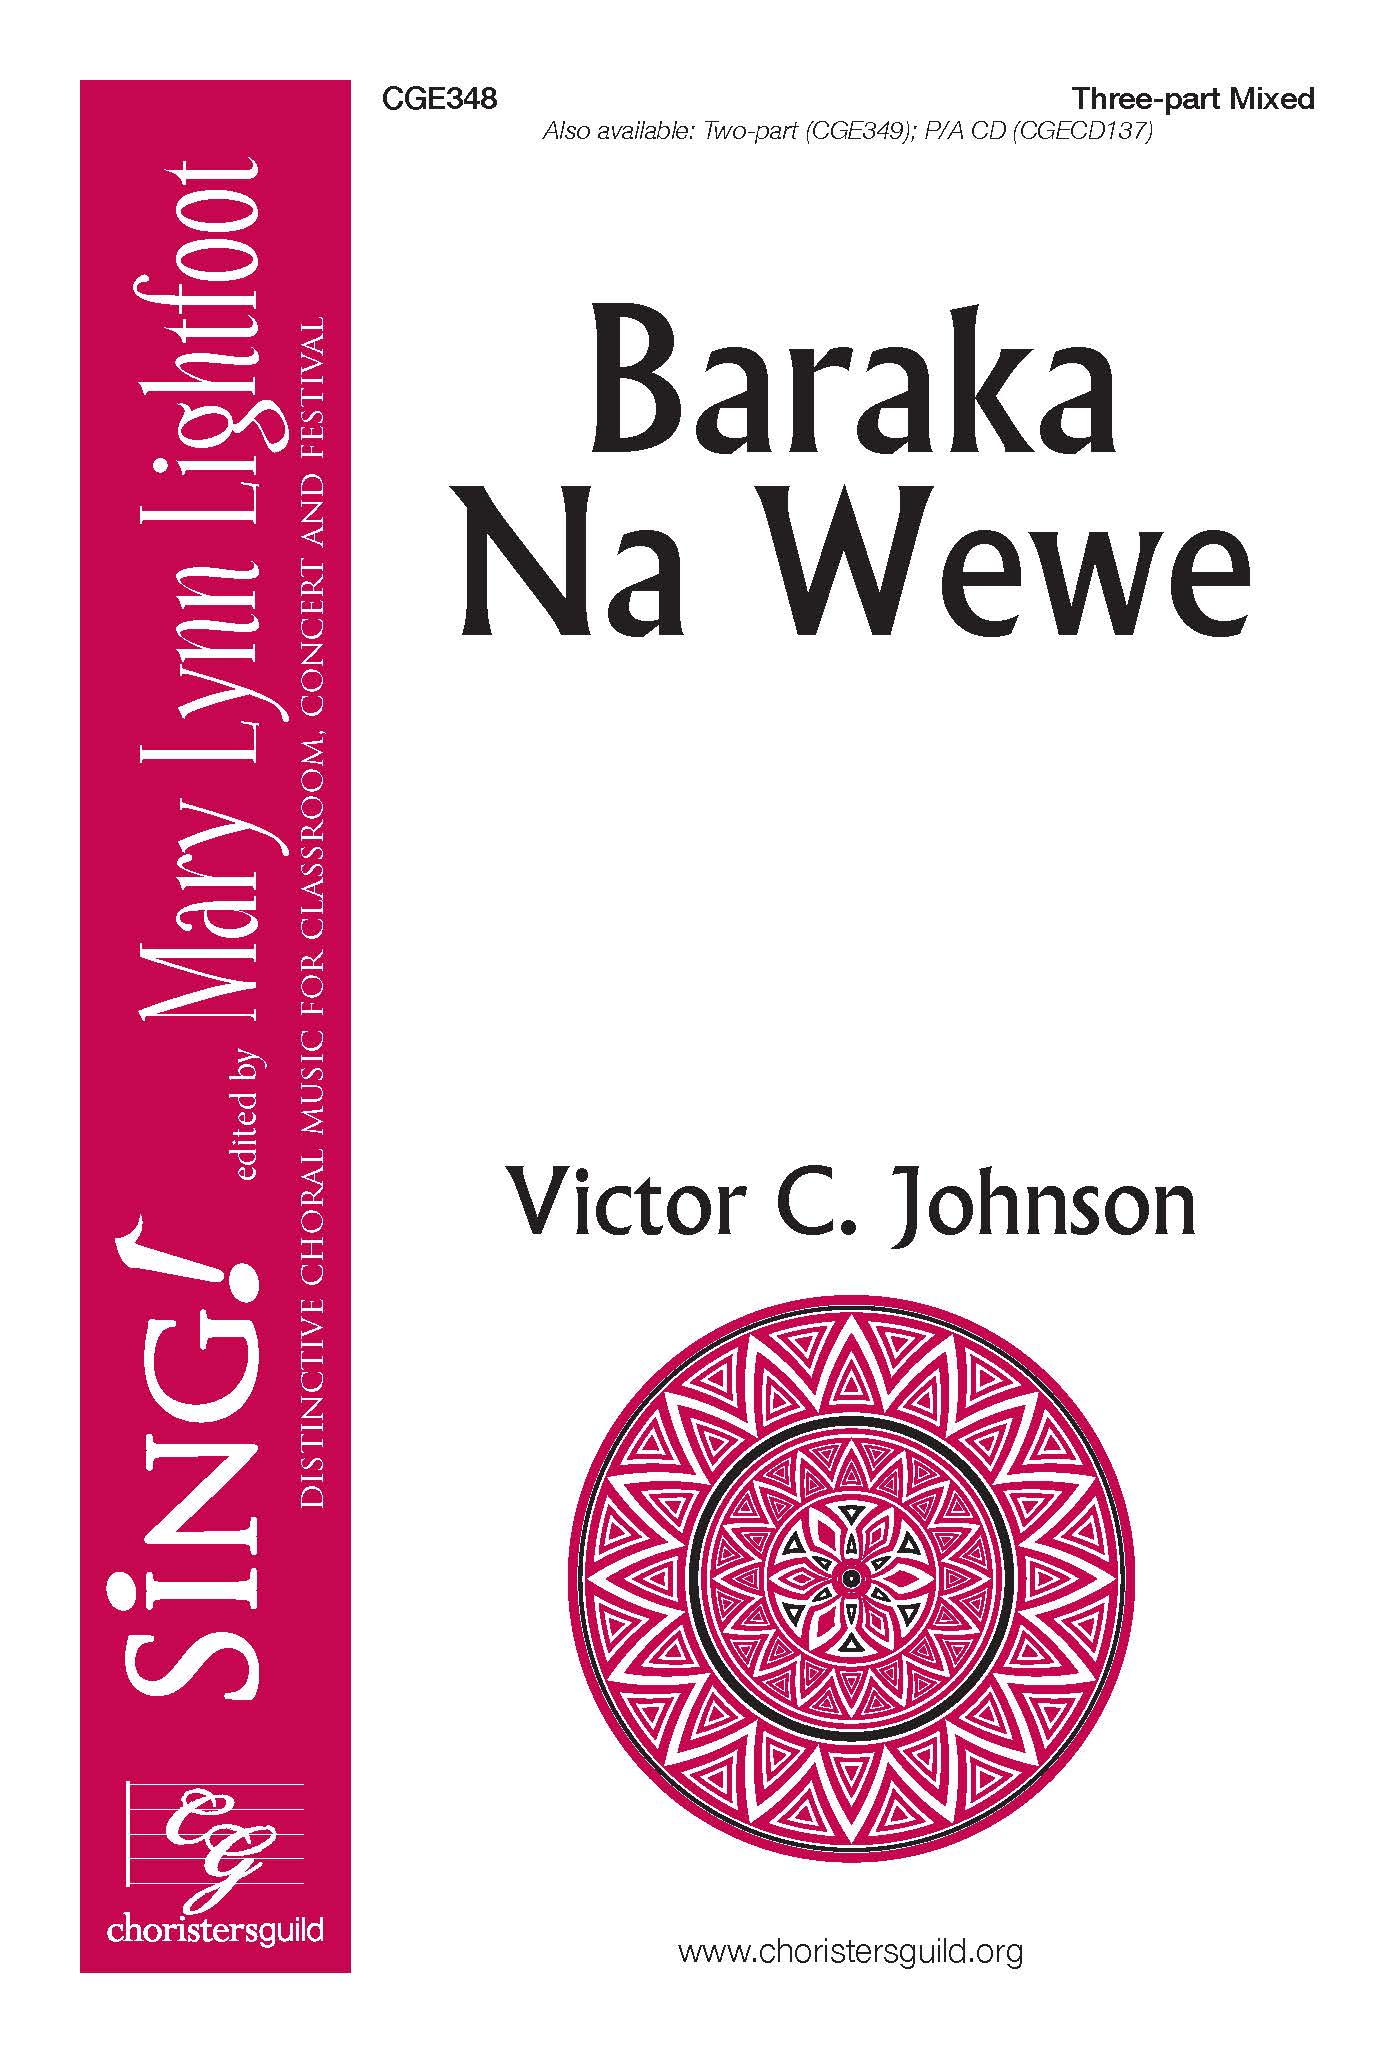 Baraka Na Wewe - Three-part Mixed